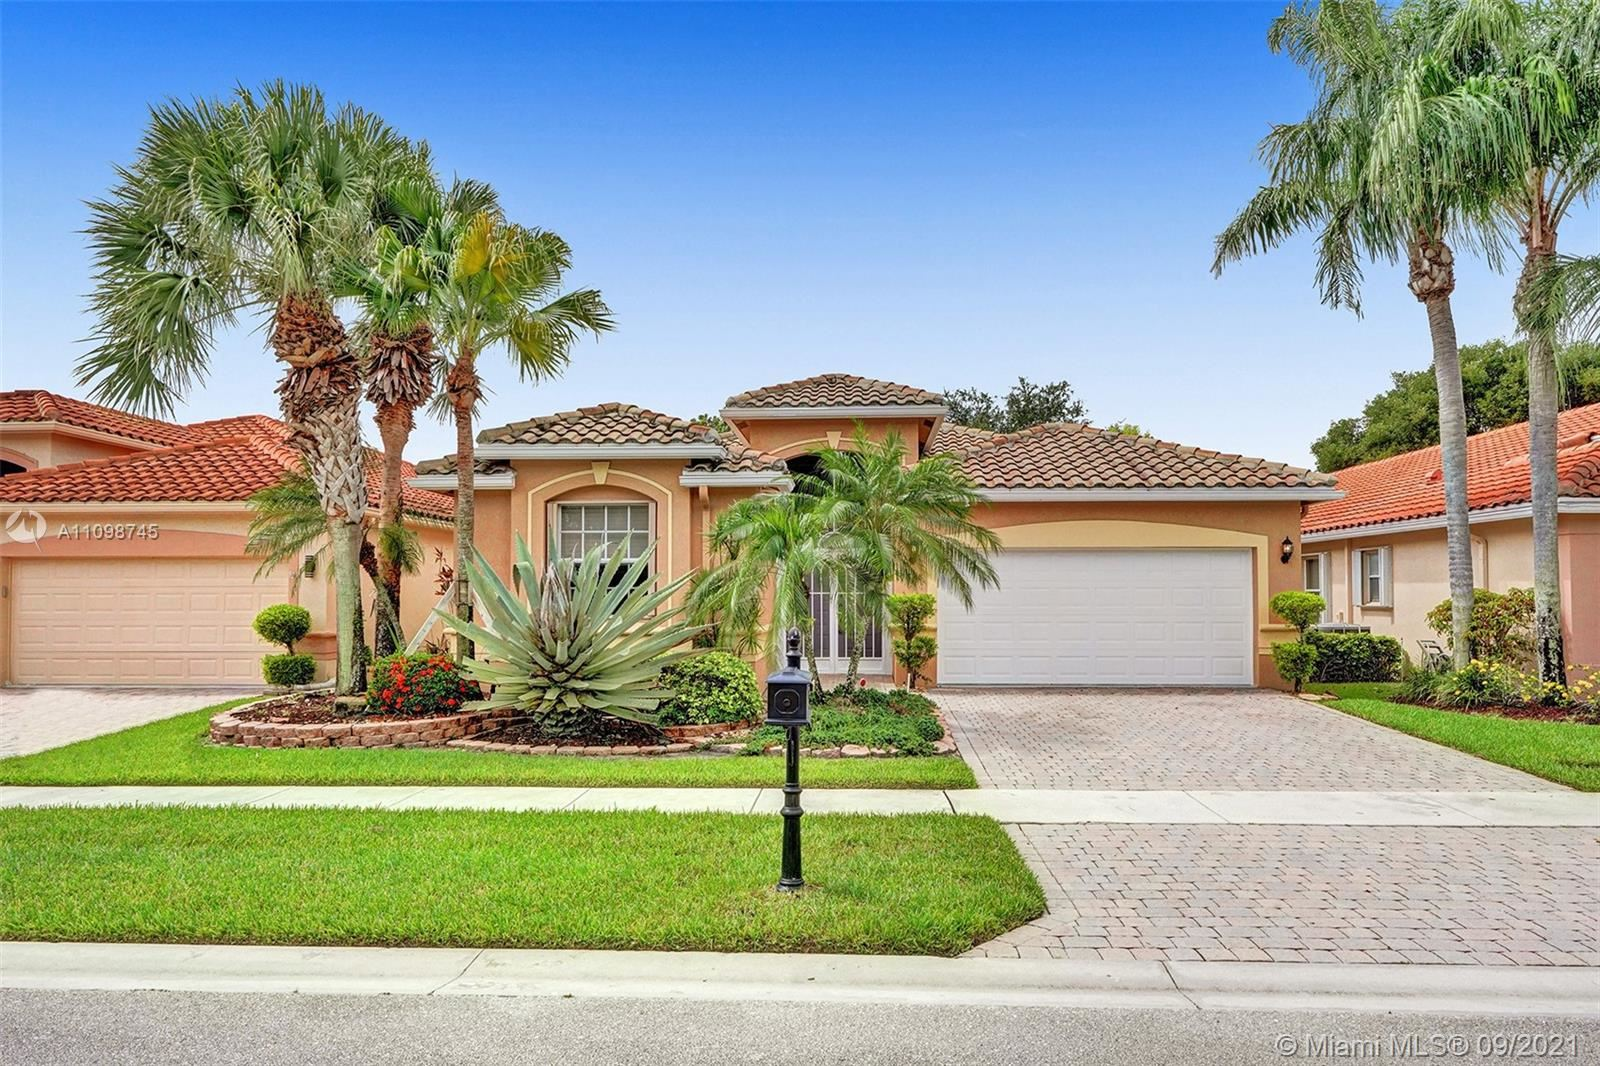 7688 Trapani Ln, Boynton Beach, FL 33472 - #: A11098745